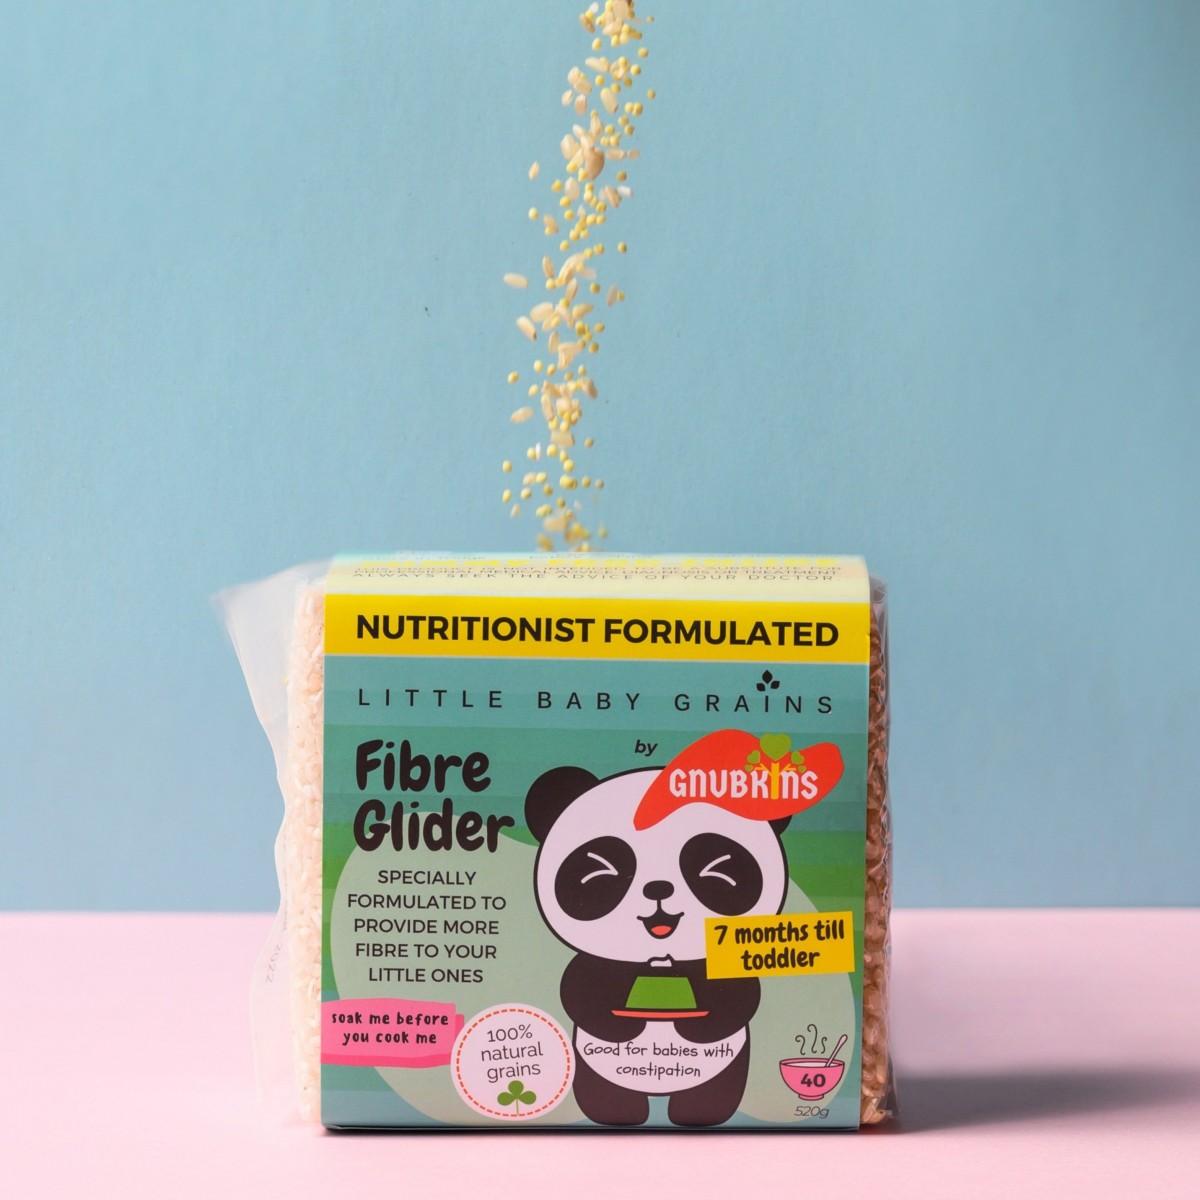 Nutritionist Formulated Little Baby Grains 520g (6+months onwards)